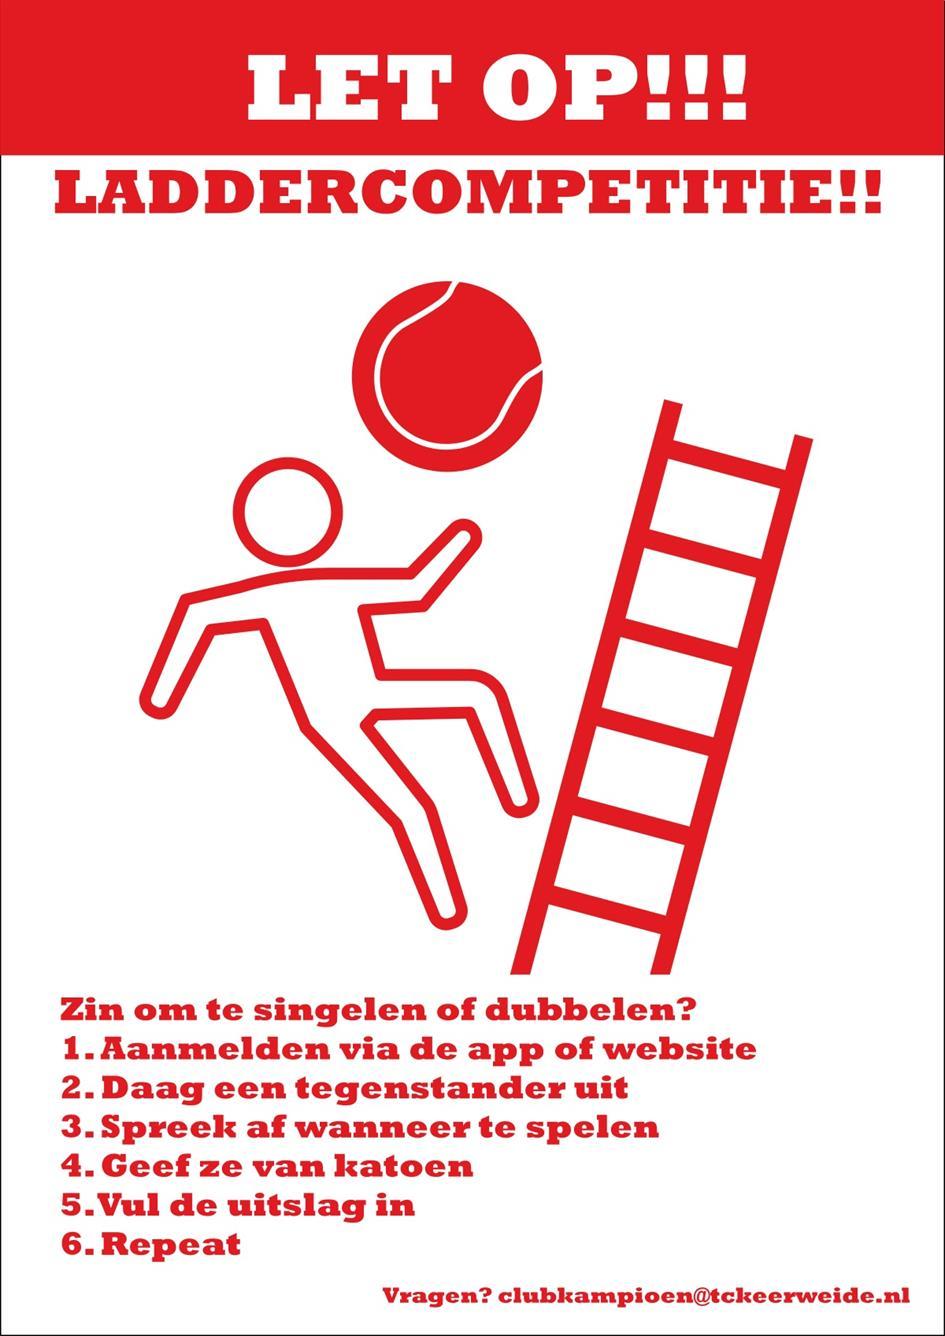 20210413 Poster laddercompetitie.jpg